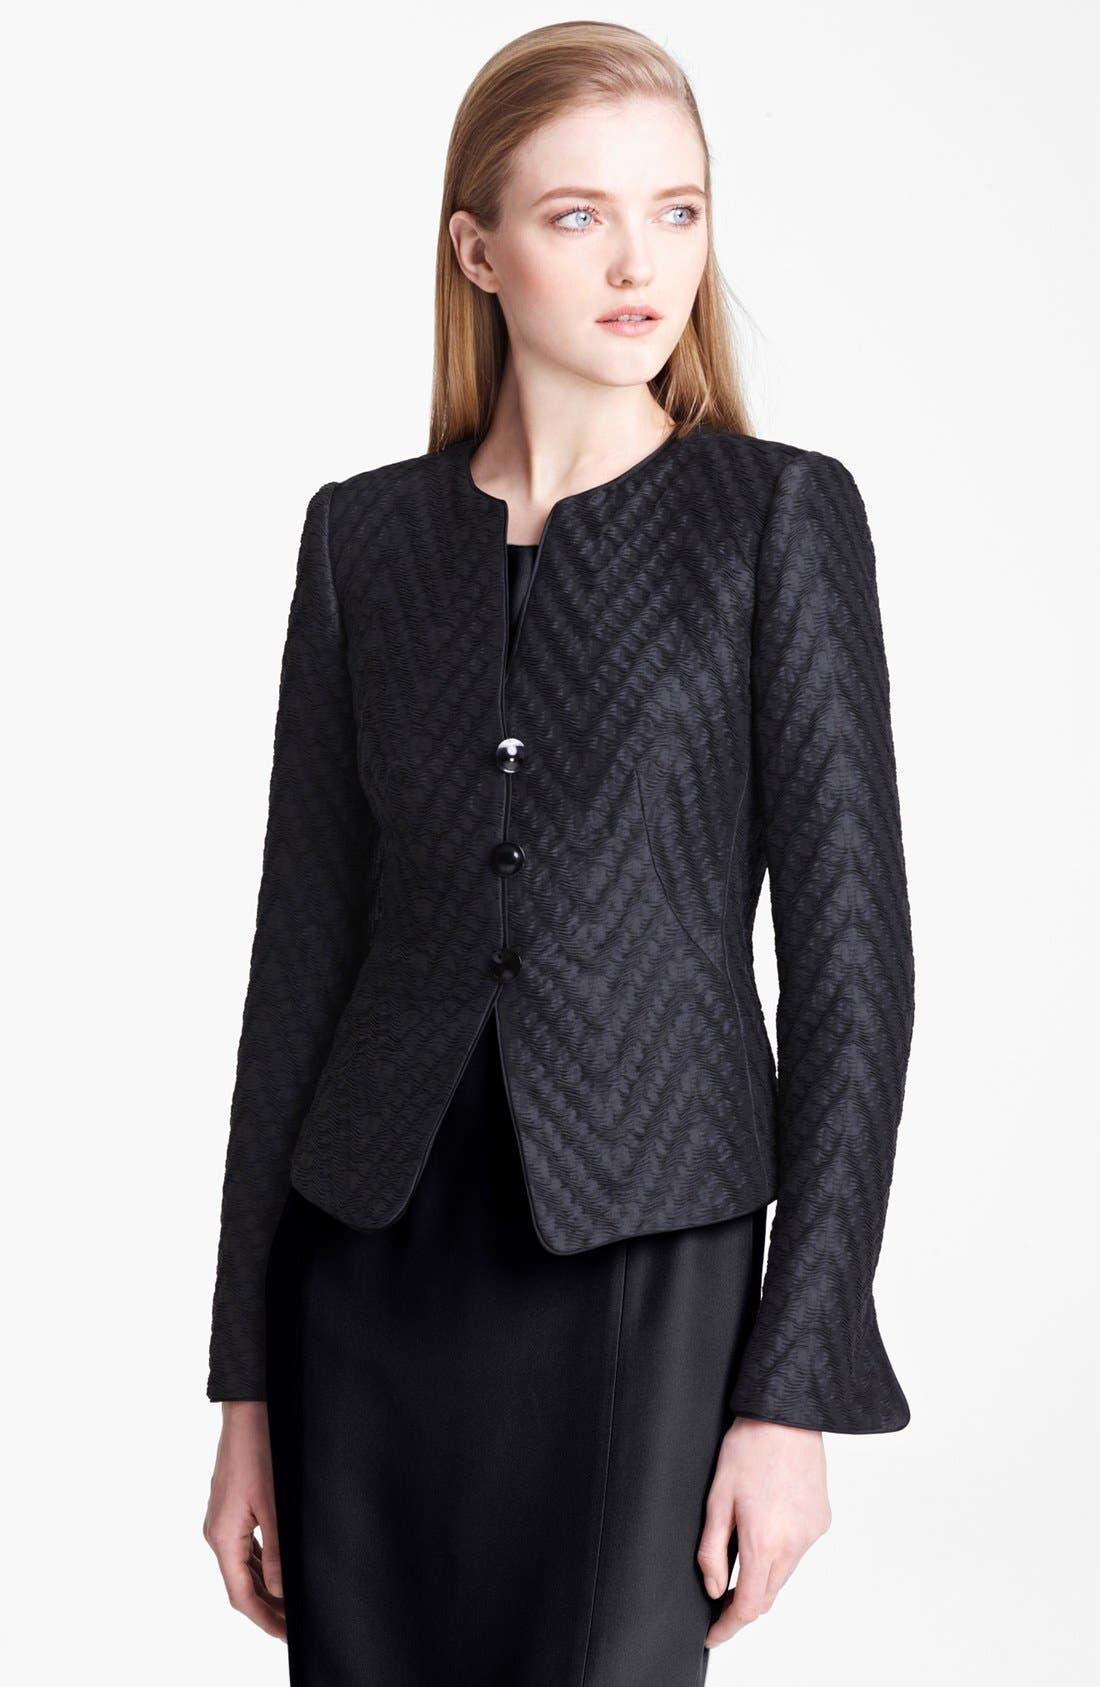 Alternate Image 1 Selected - Armani Collezioni Wave Jacquard Jacket